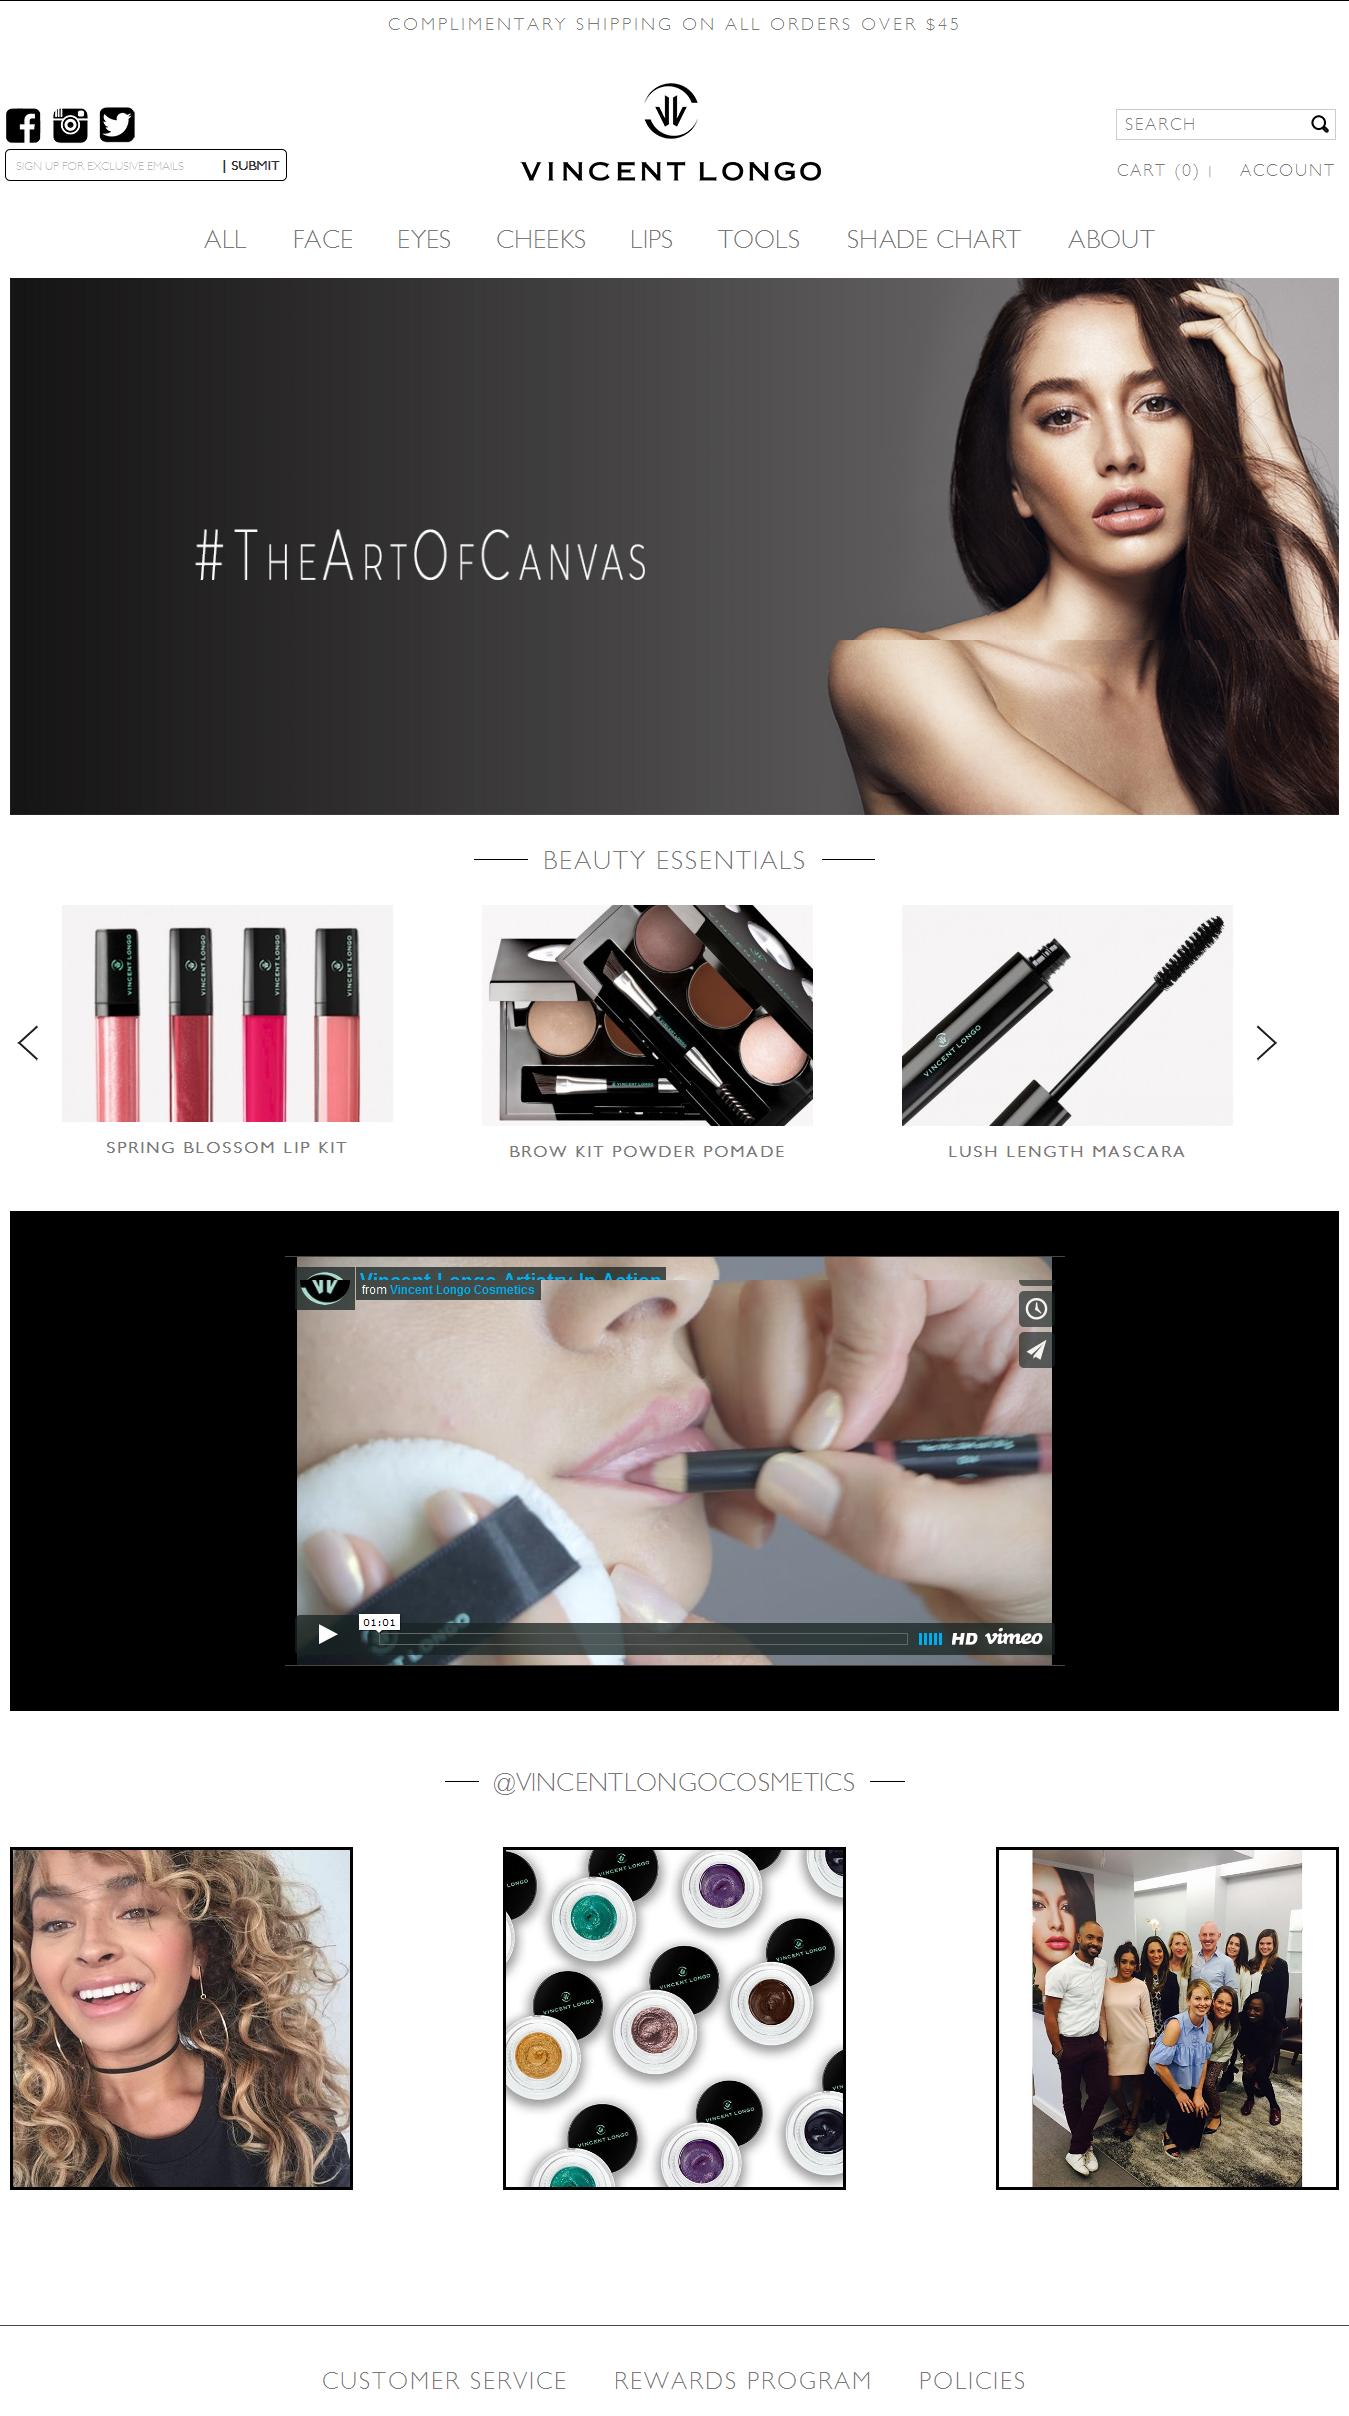 VL Cosmetics